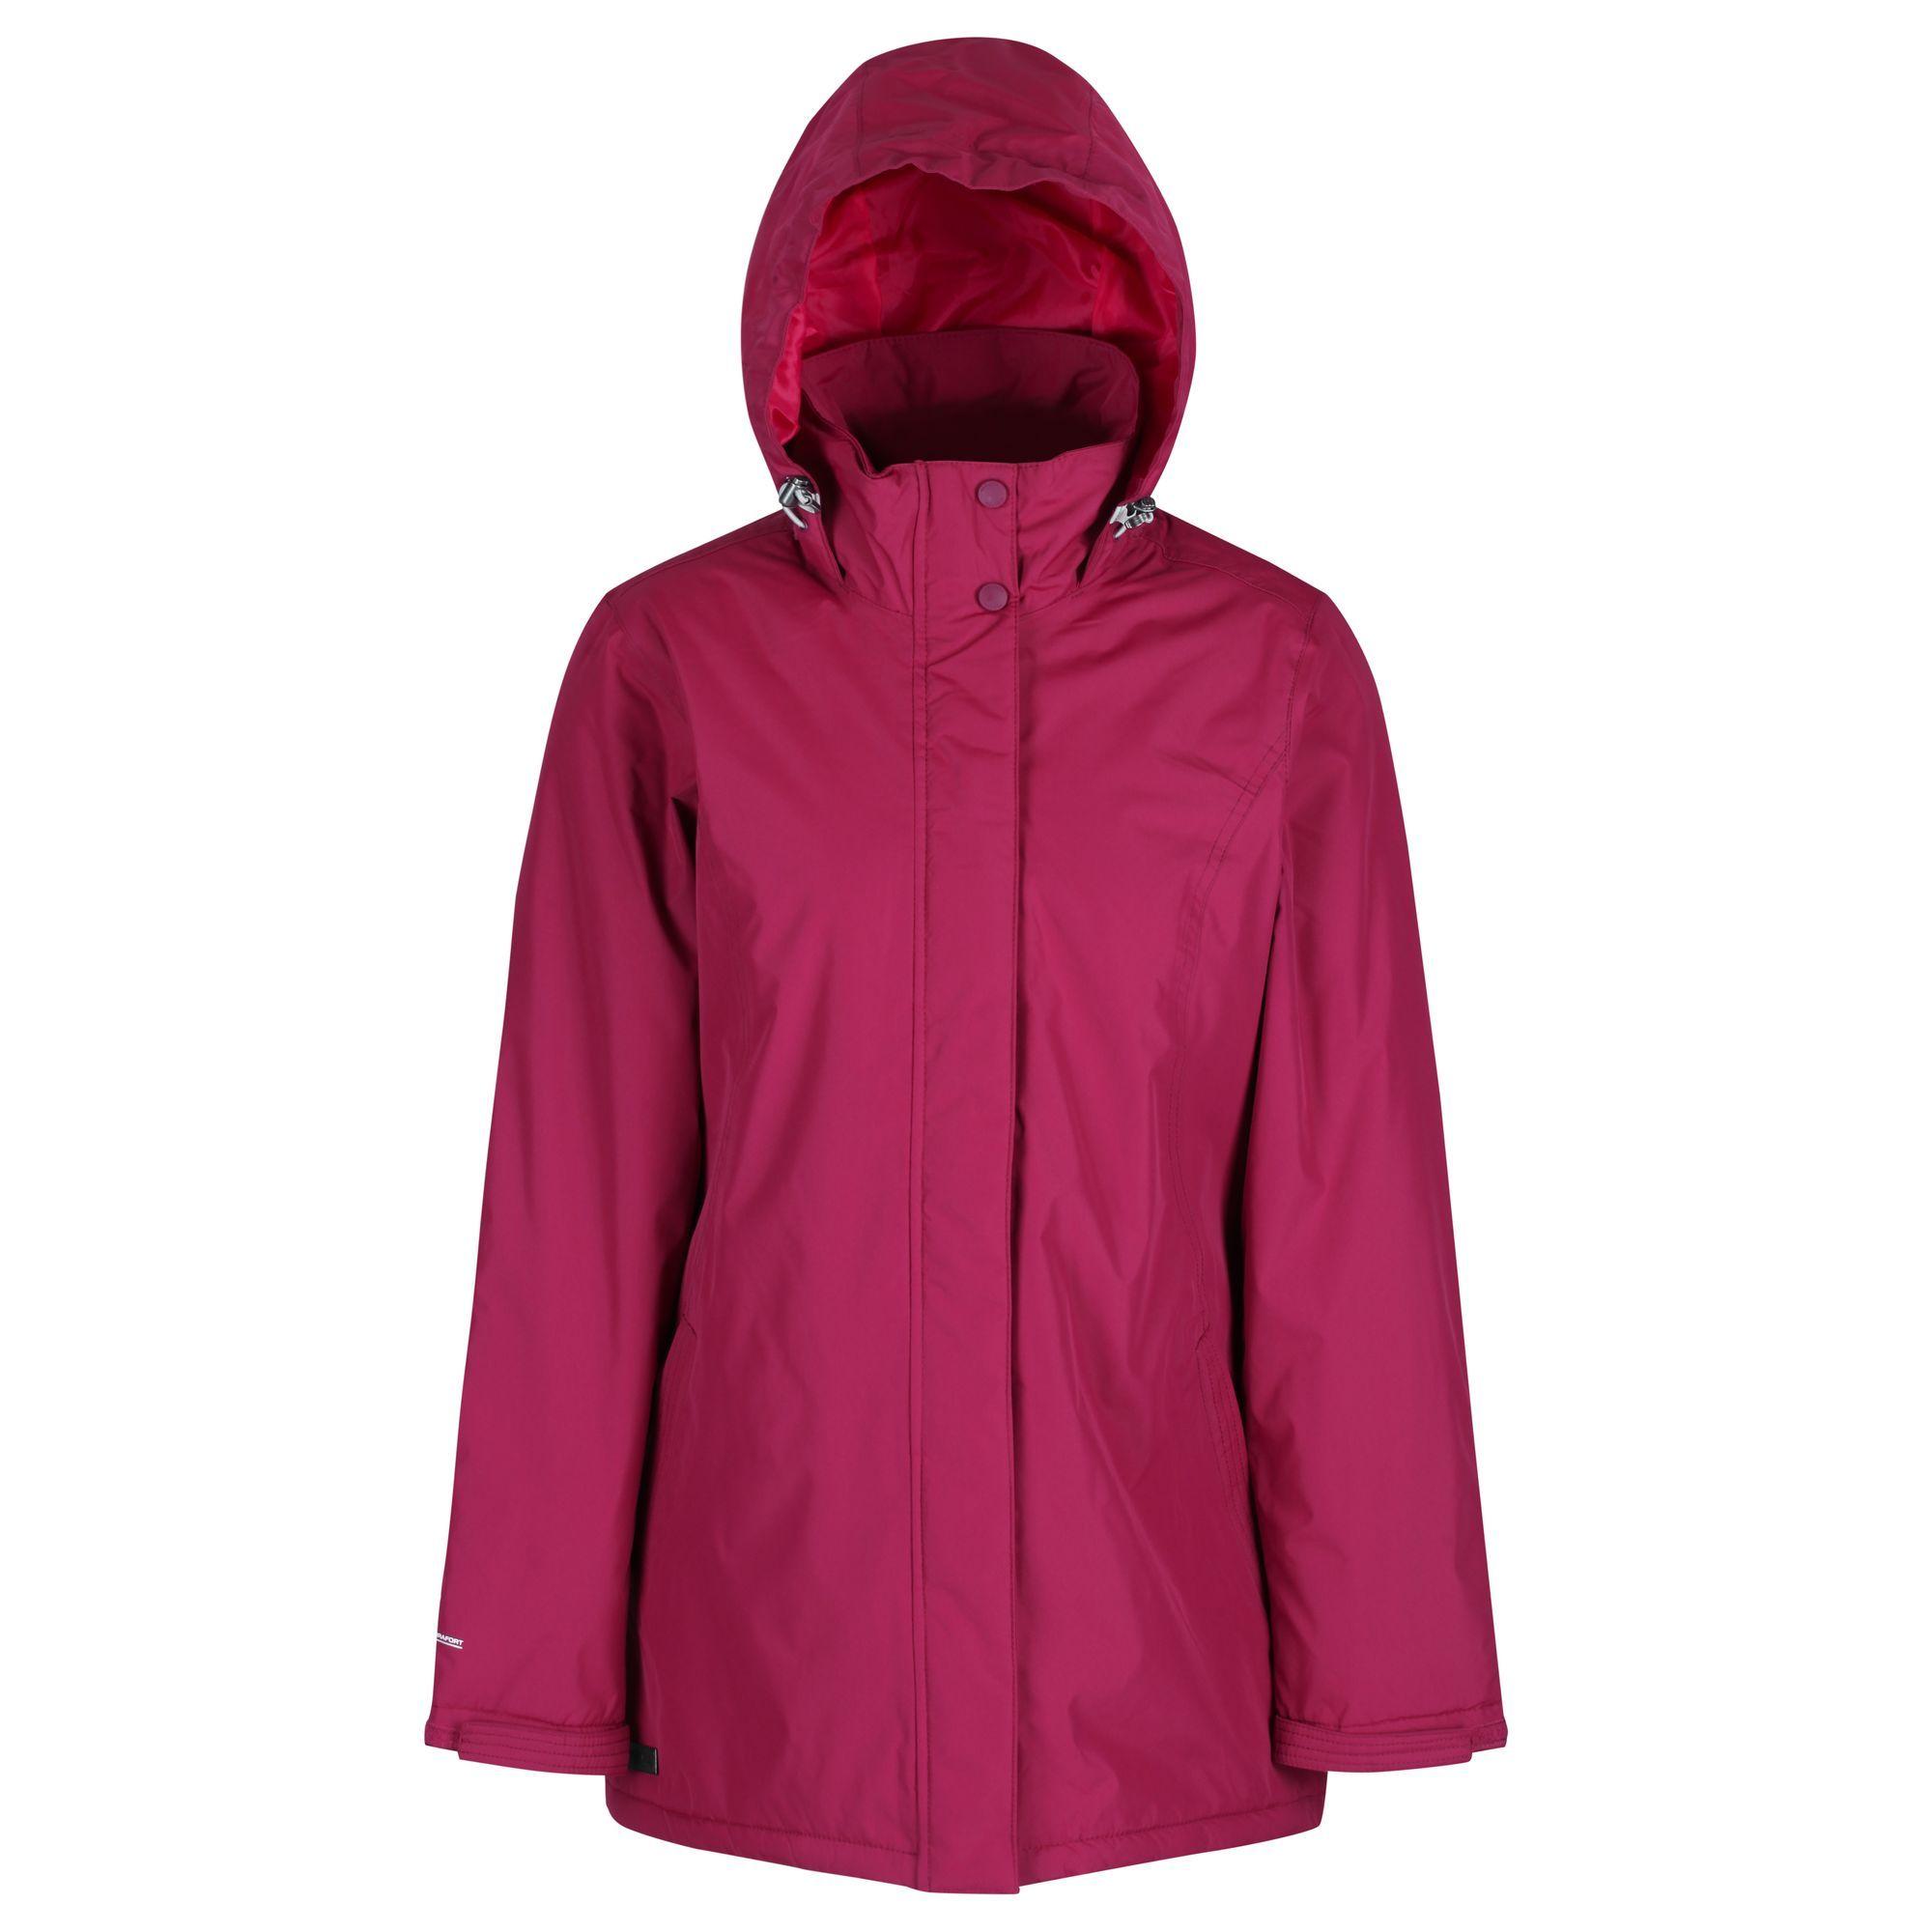 Regatta Women's Blanchet II Jacket (Beetroot)